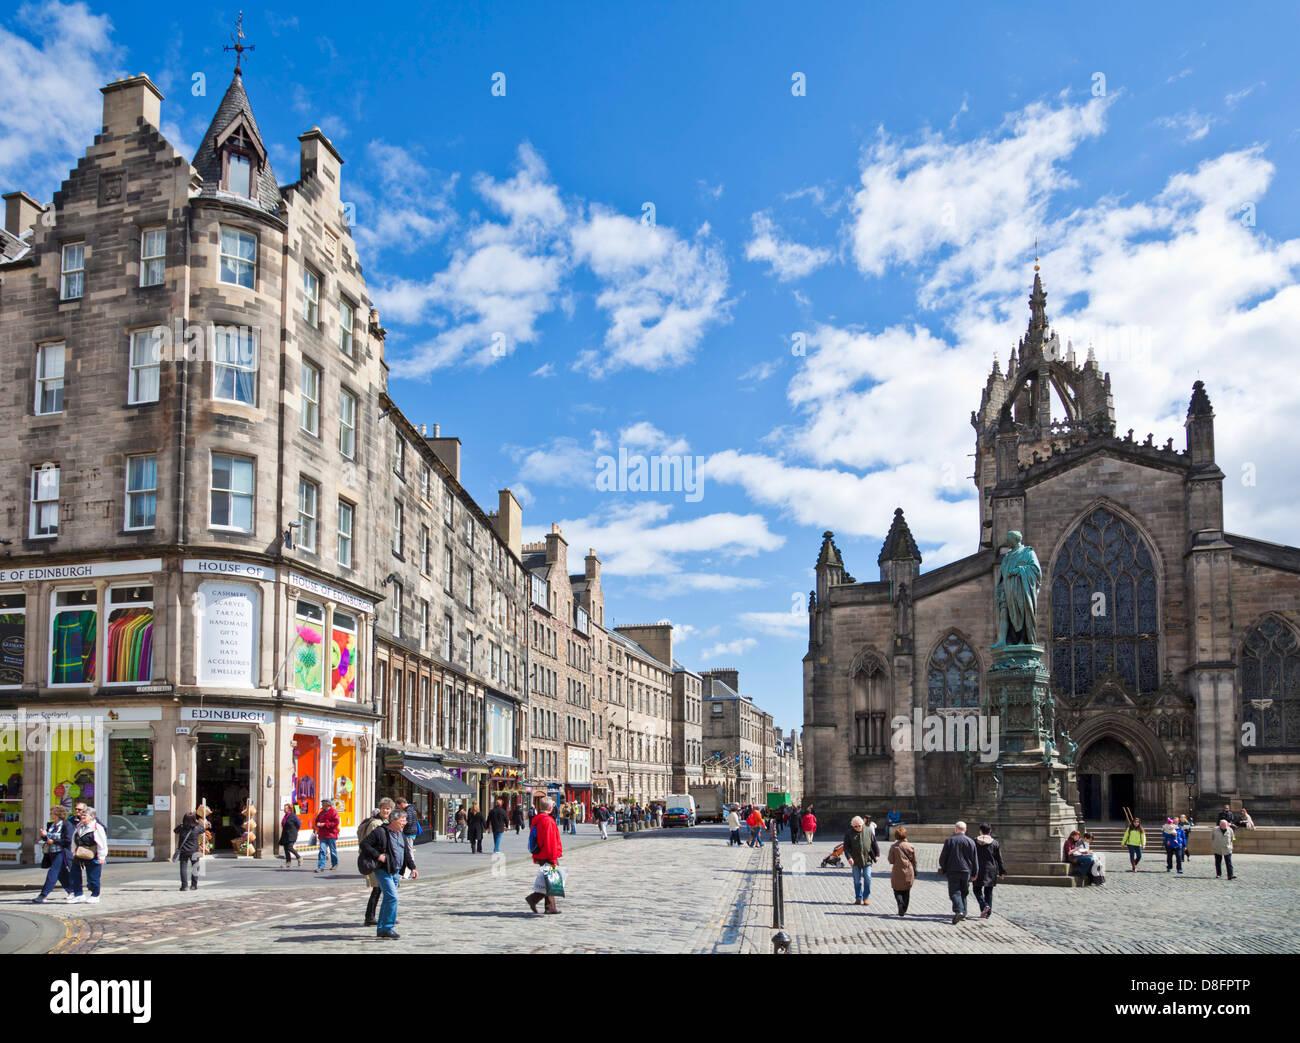 St Giles cathedral High Street Edinburgh royal Mile Midlothian Scotland UK GB EU Europe - Stock Image